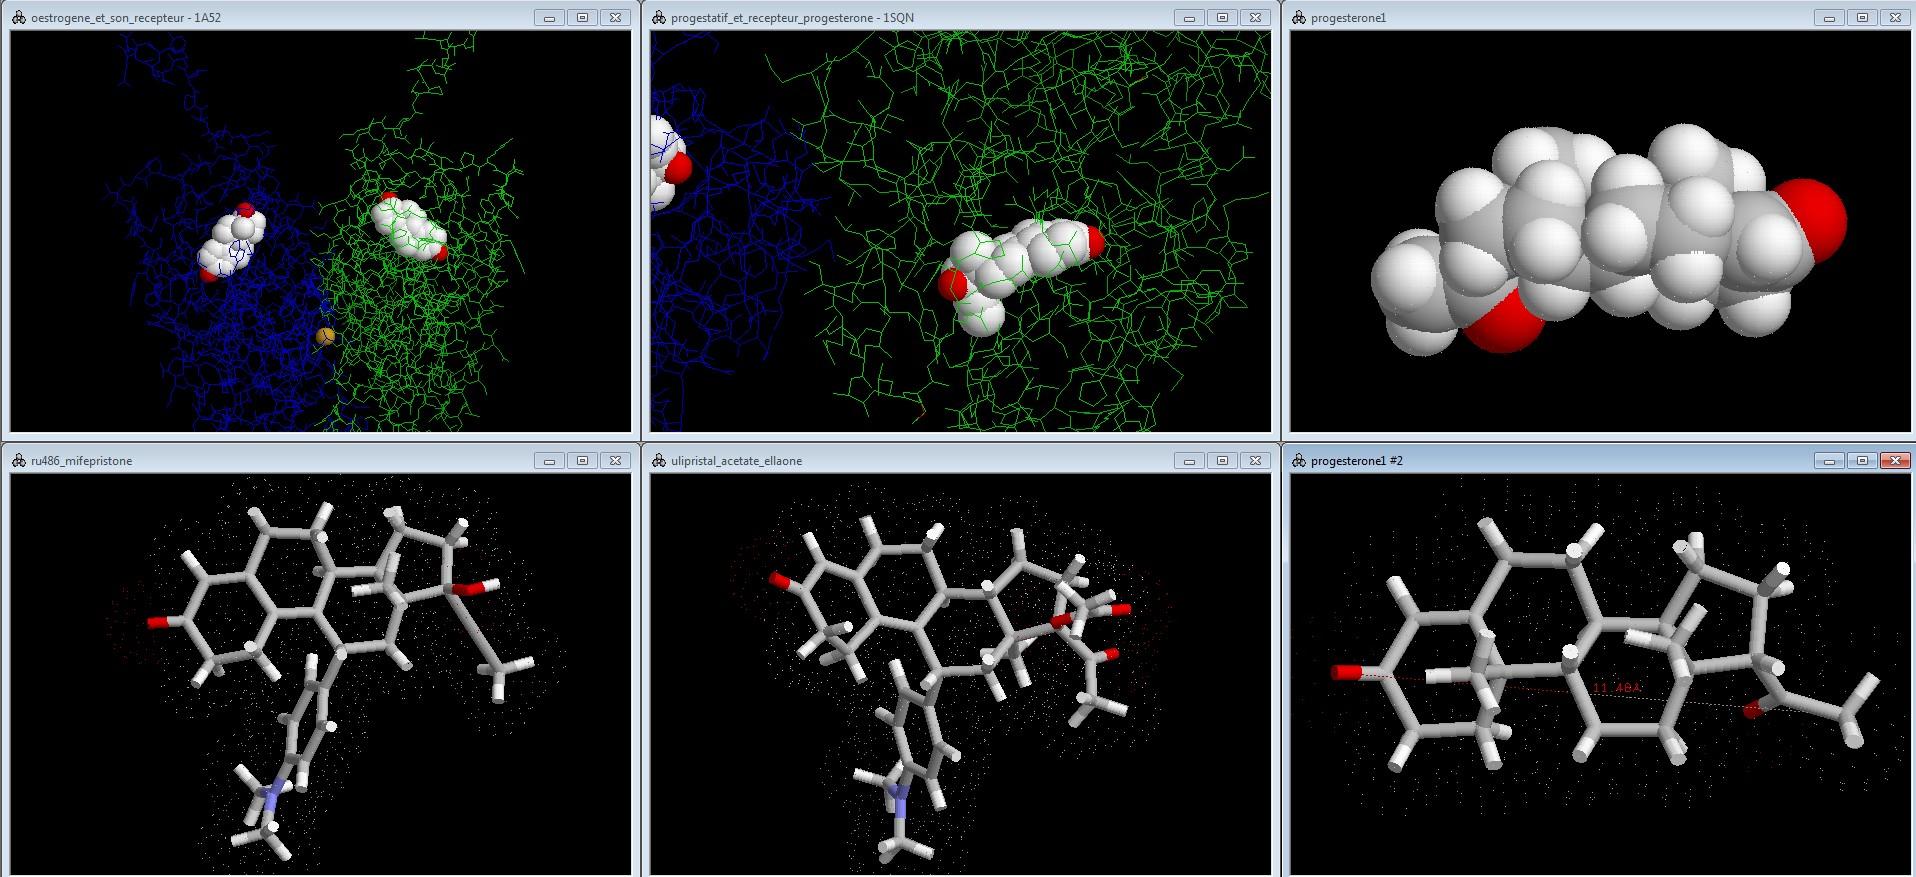 molecule pour rastop